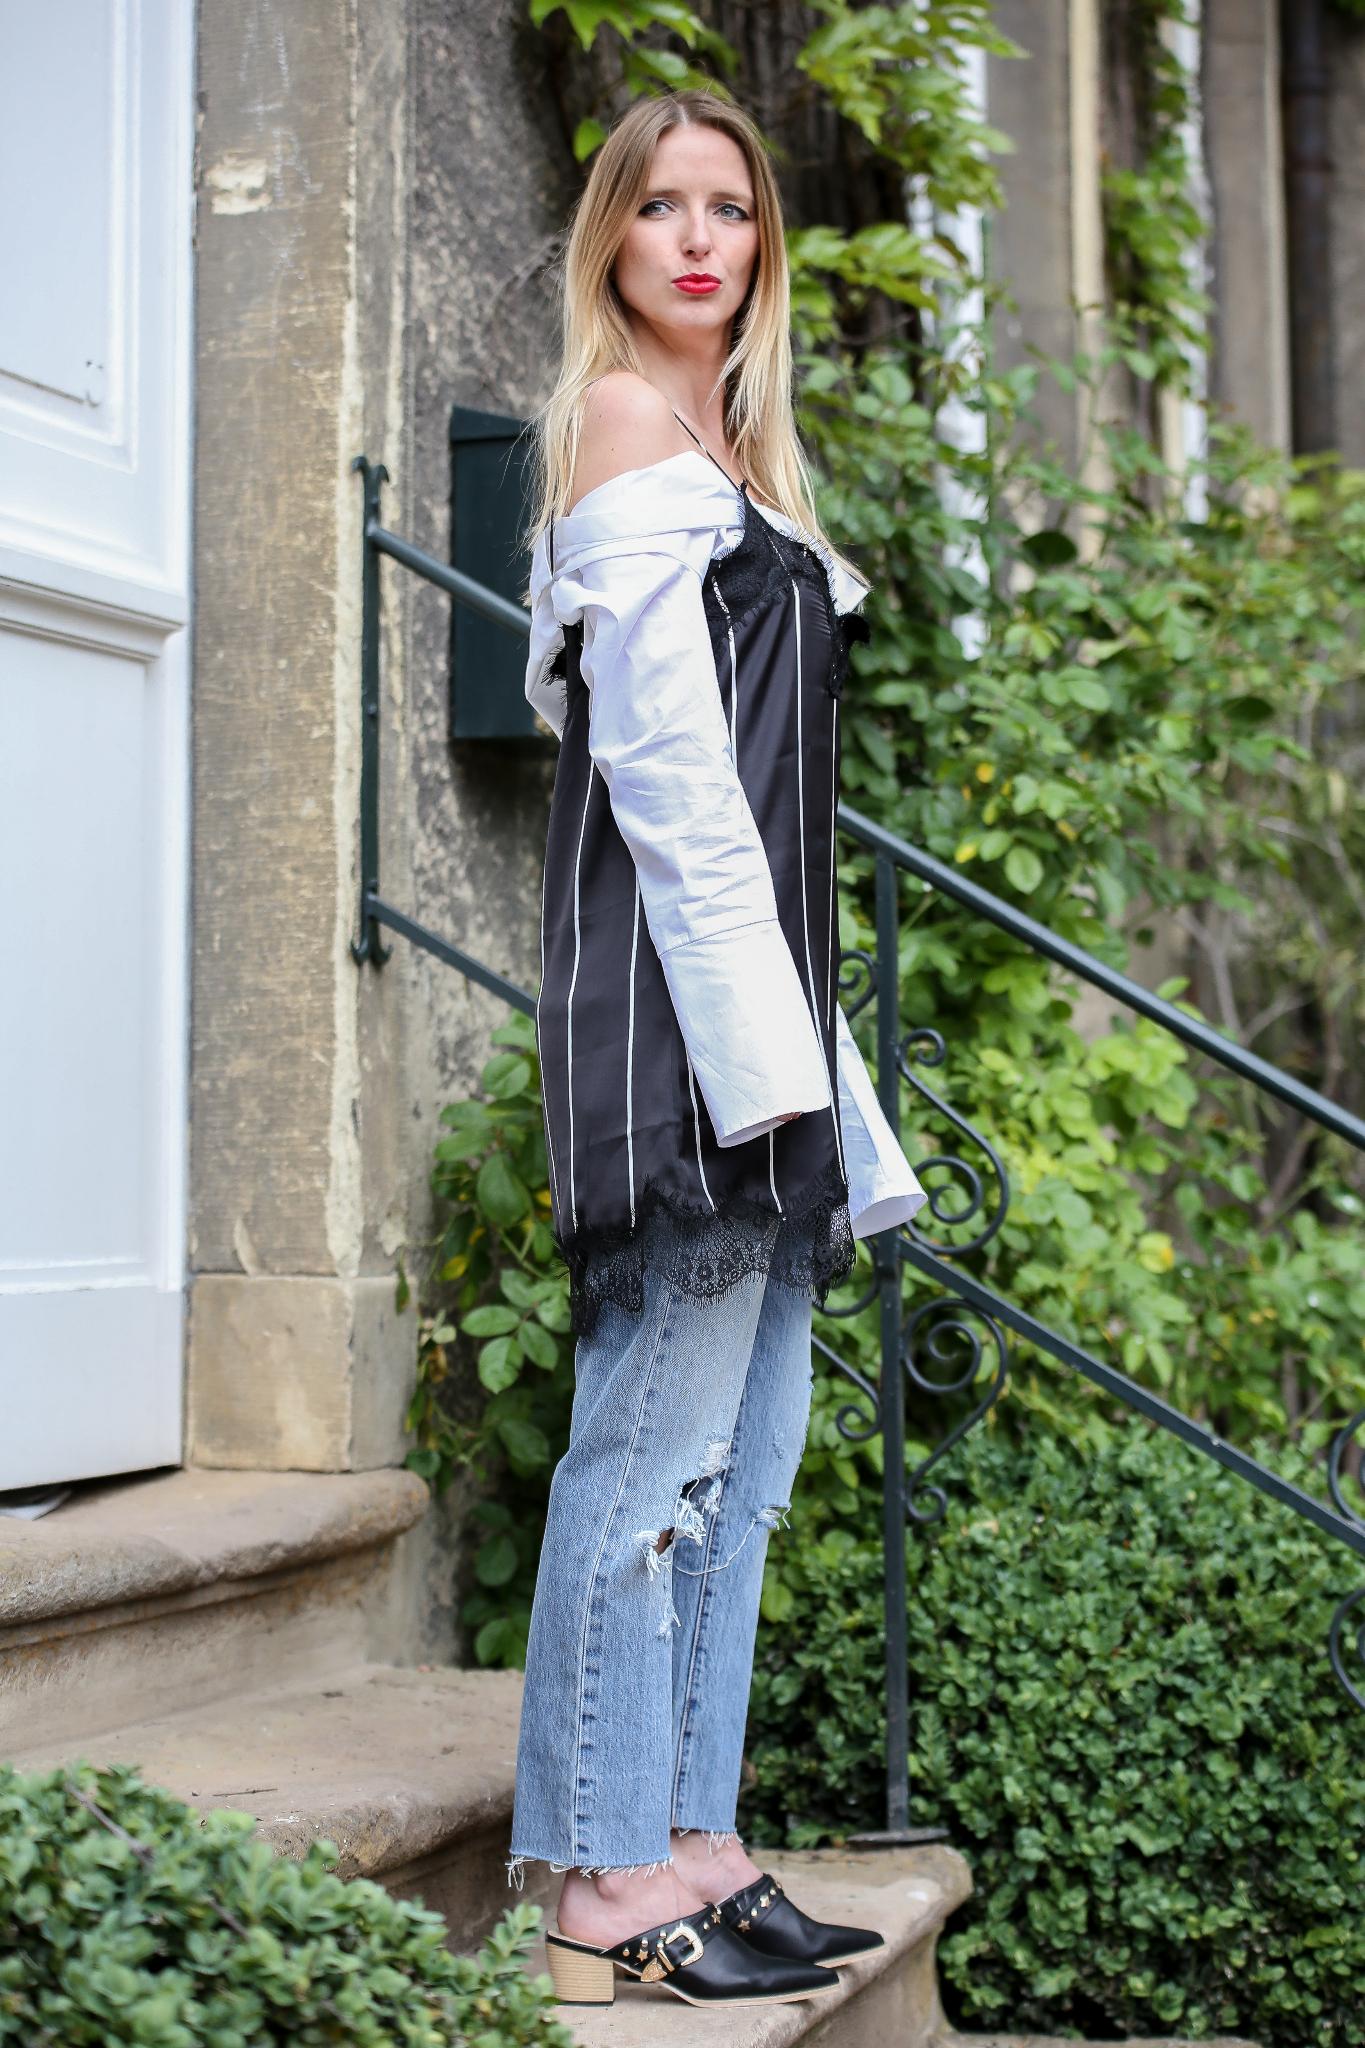 Fashion_Outfit_Off_Shoulder_Striped_Slipdress_MOD - by Monique-22